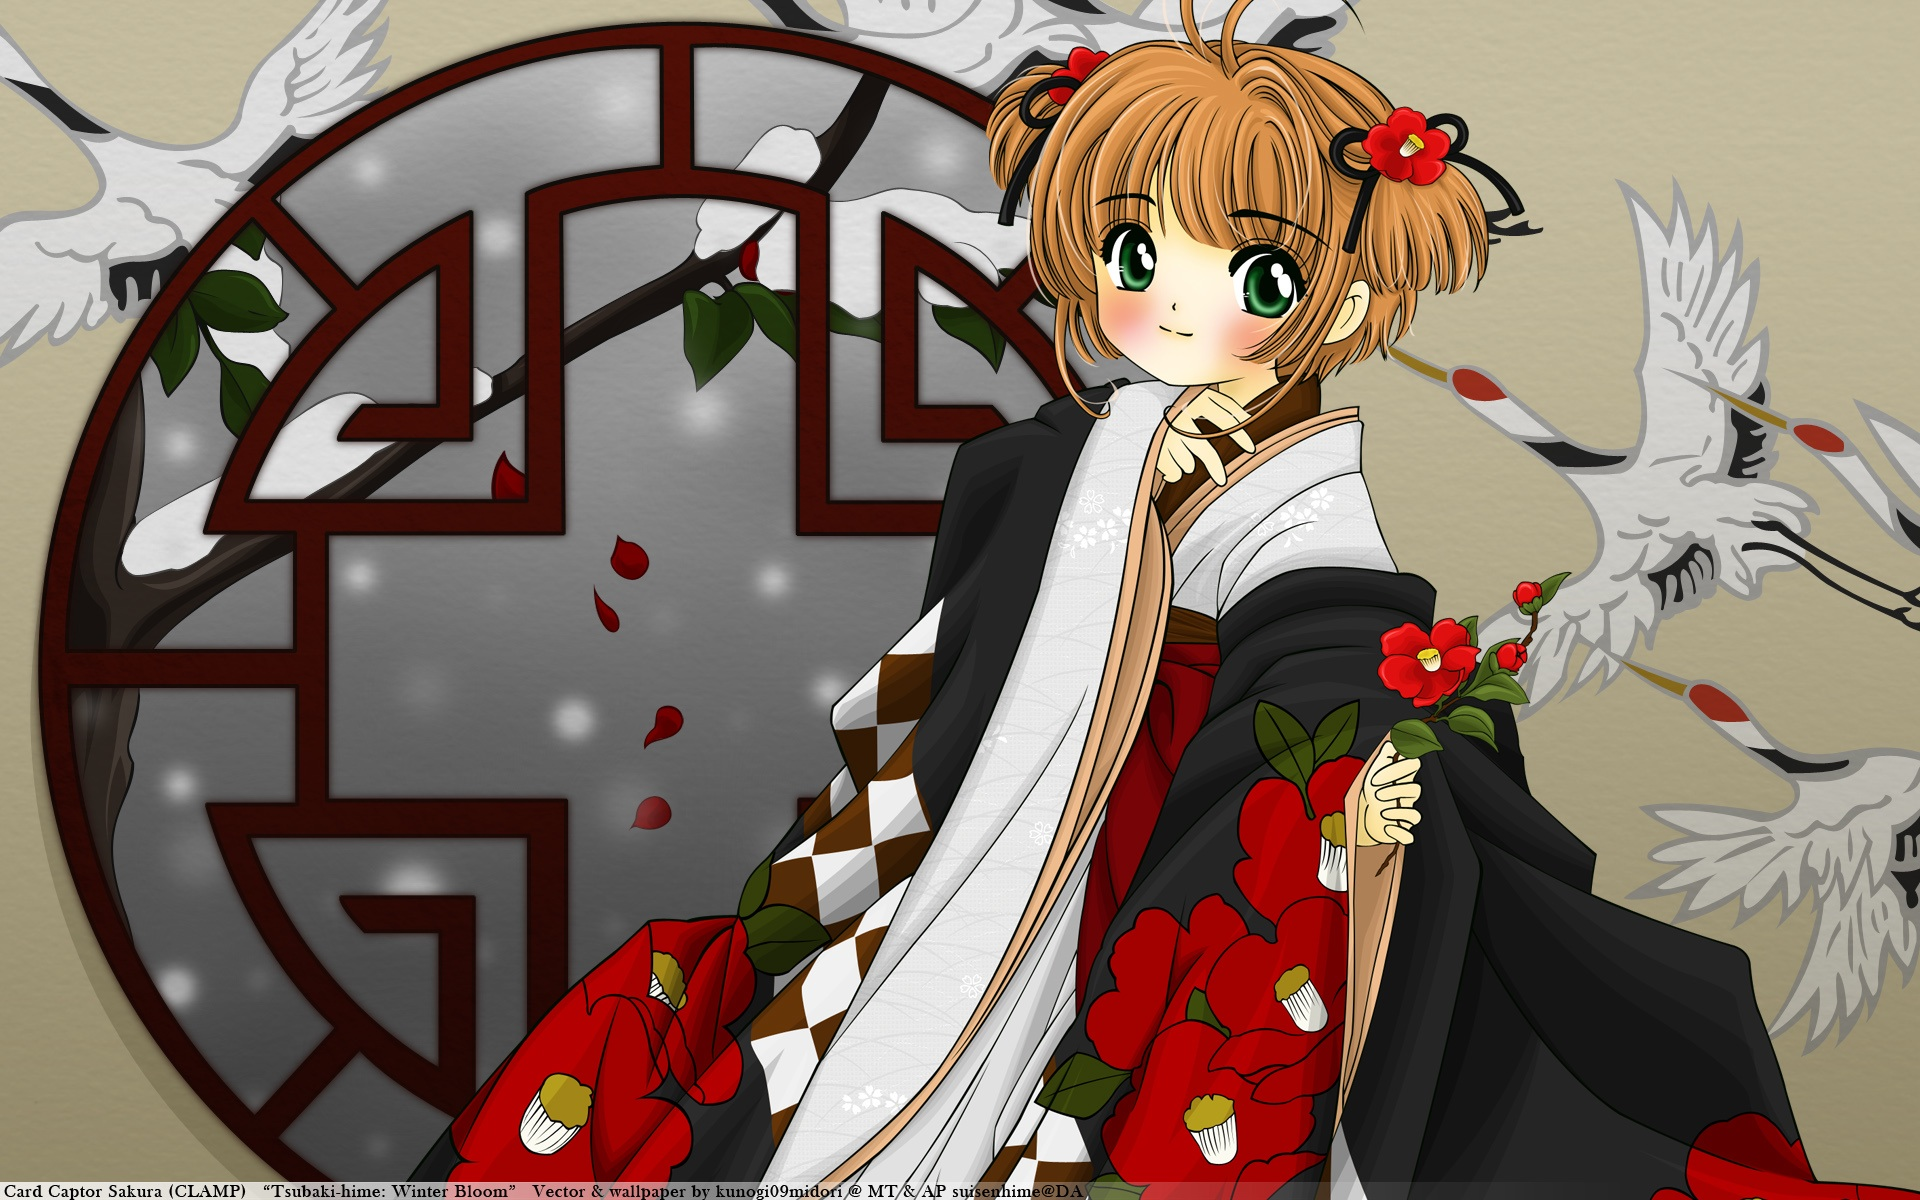 Cardcaptor sakura computer wallpapers desktop backgrounds - Sakura desktop ...